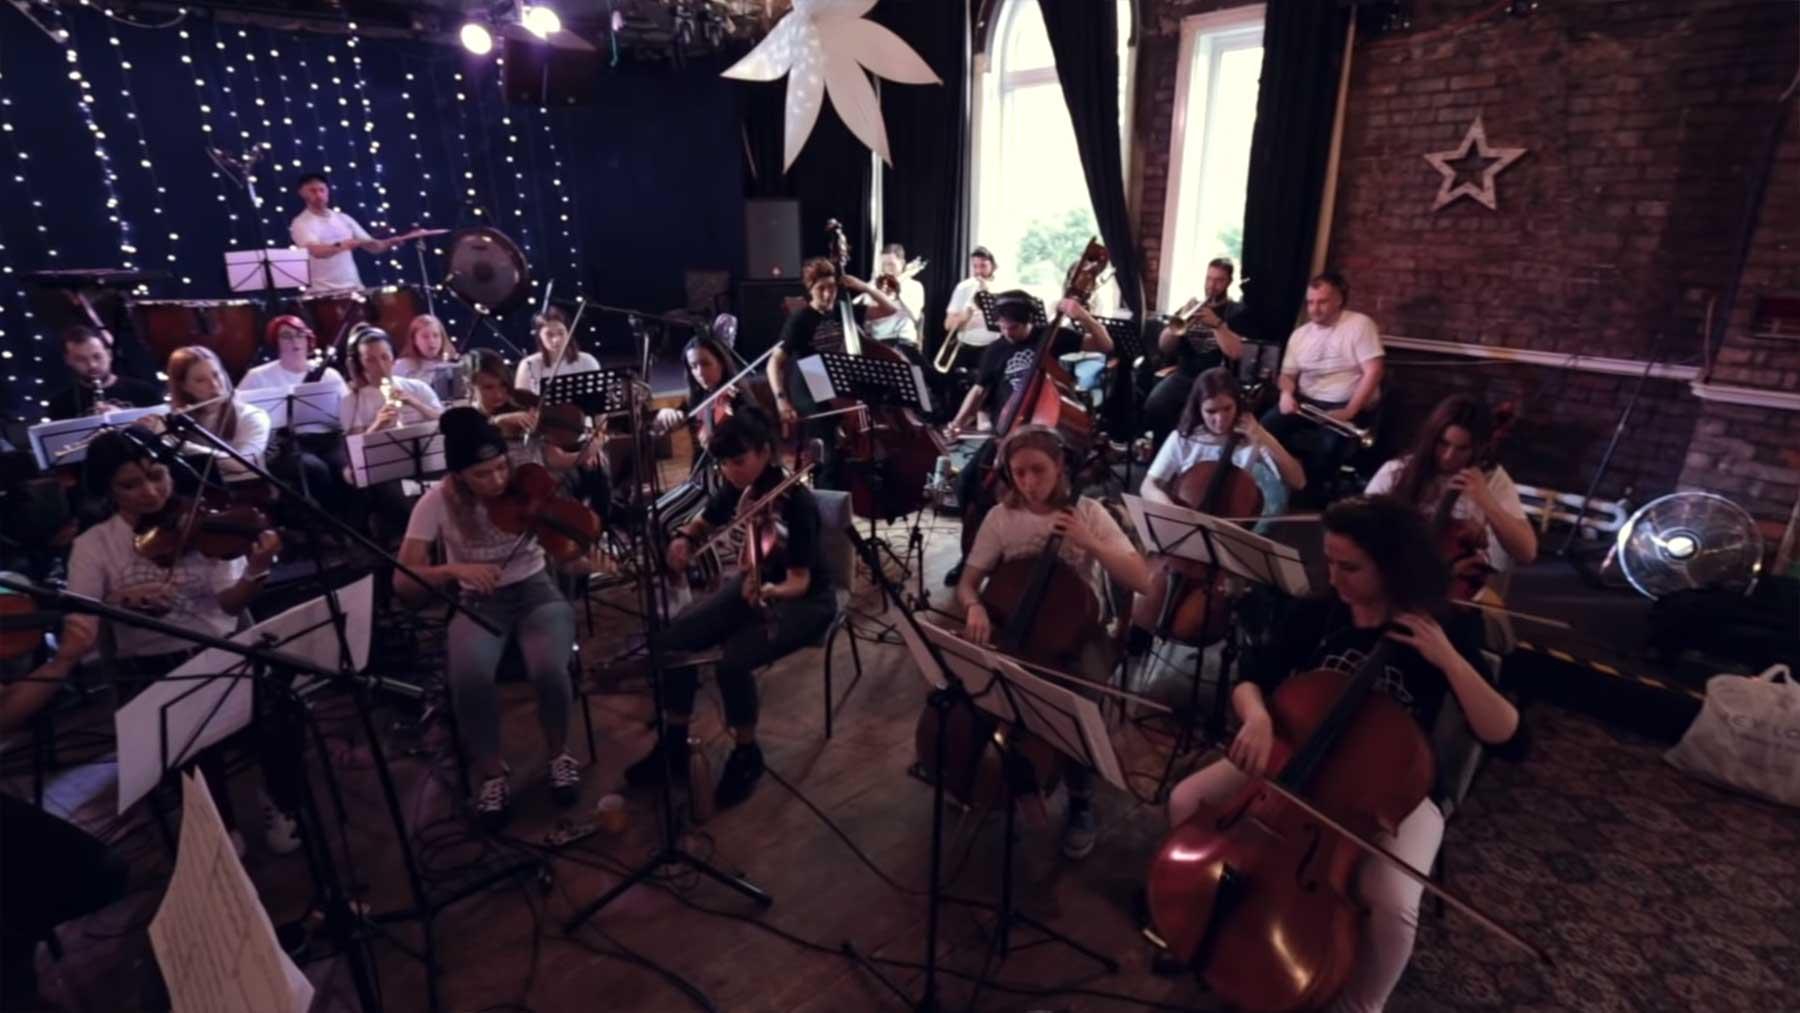 Orchester spielt Linkin Park-Medley